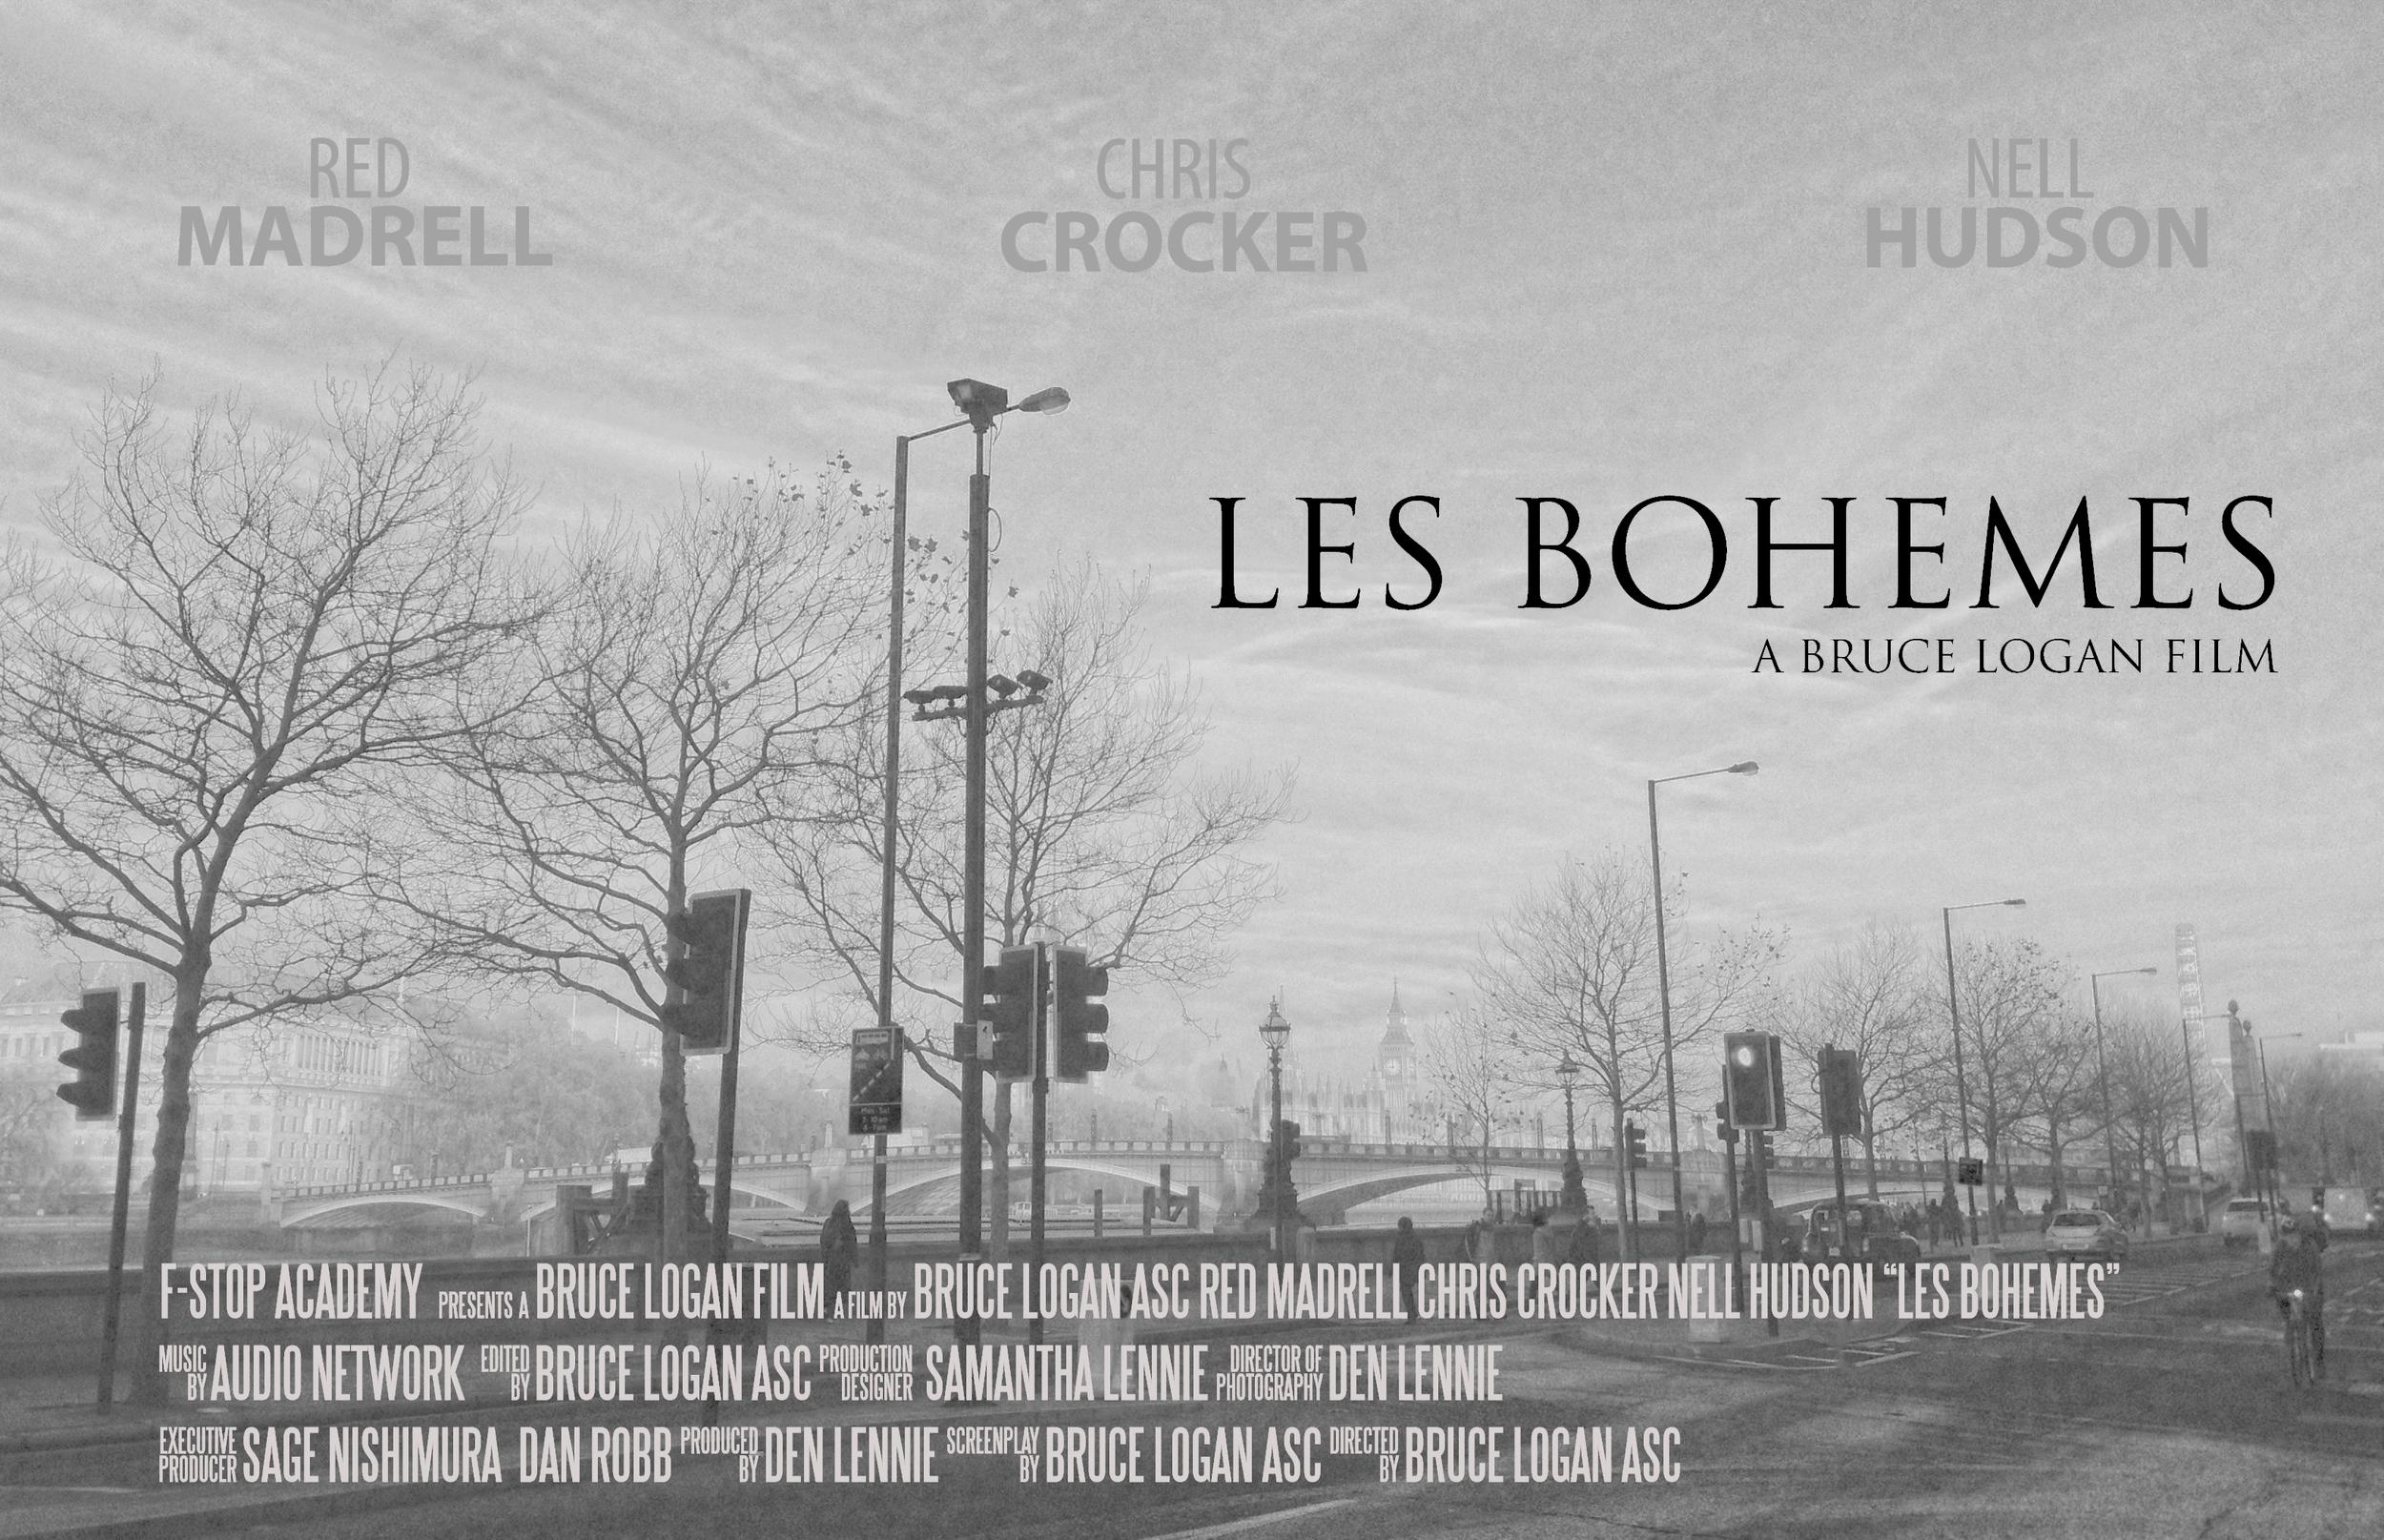 Les Bohemes Poster